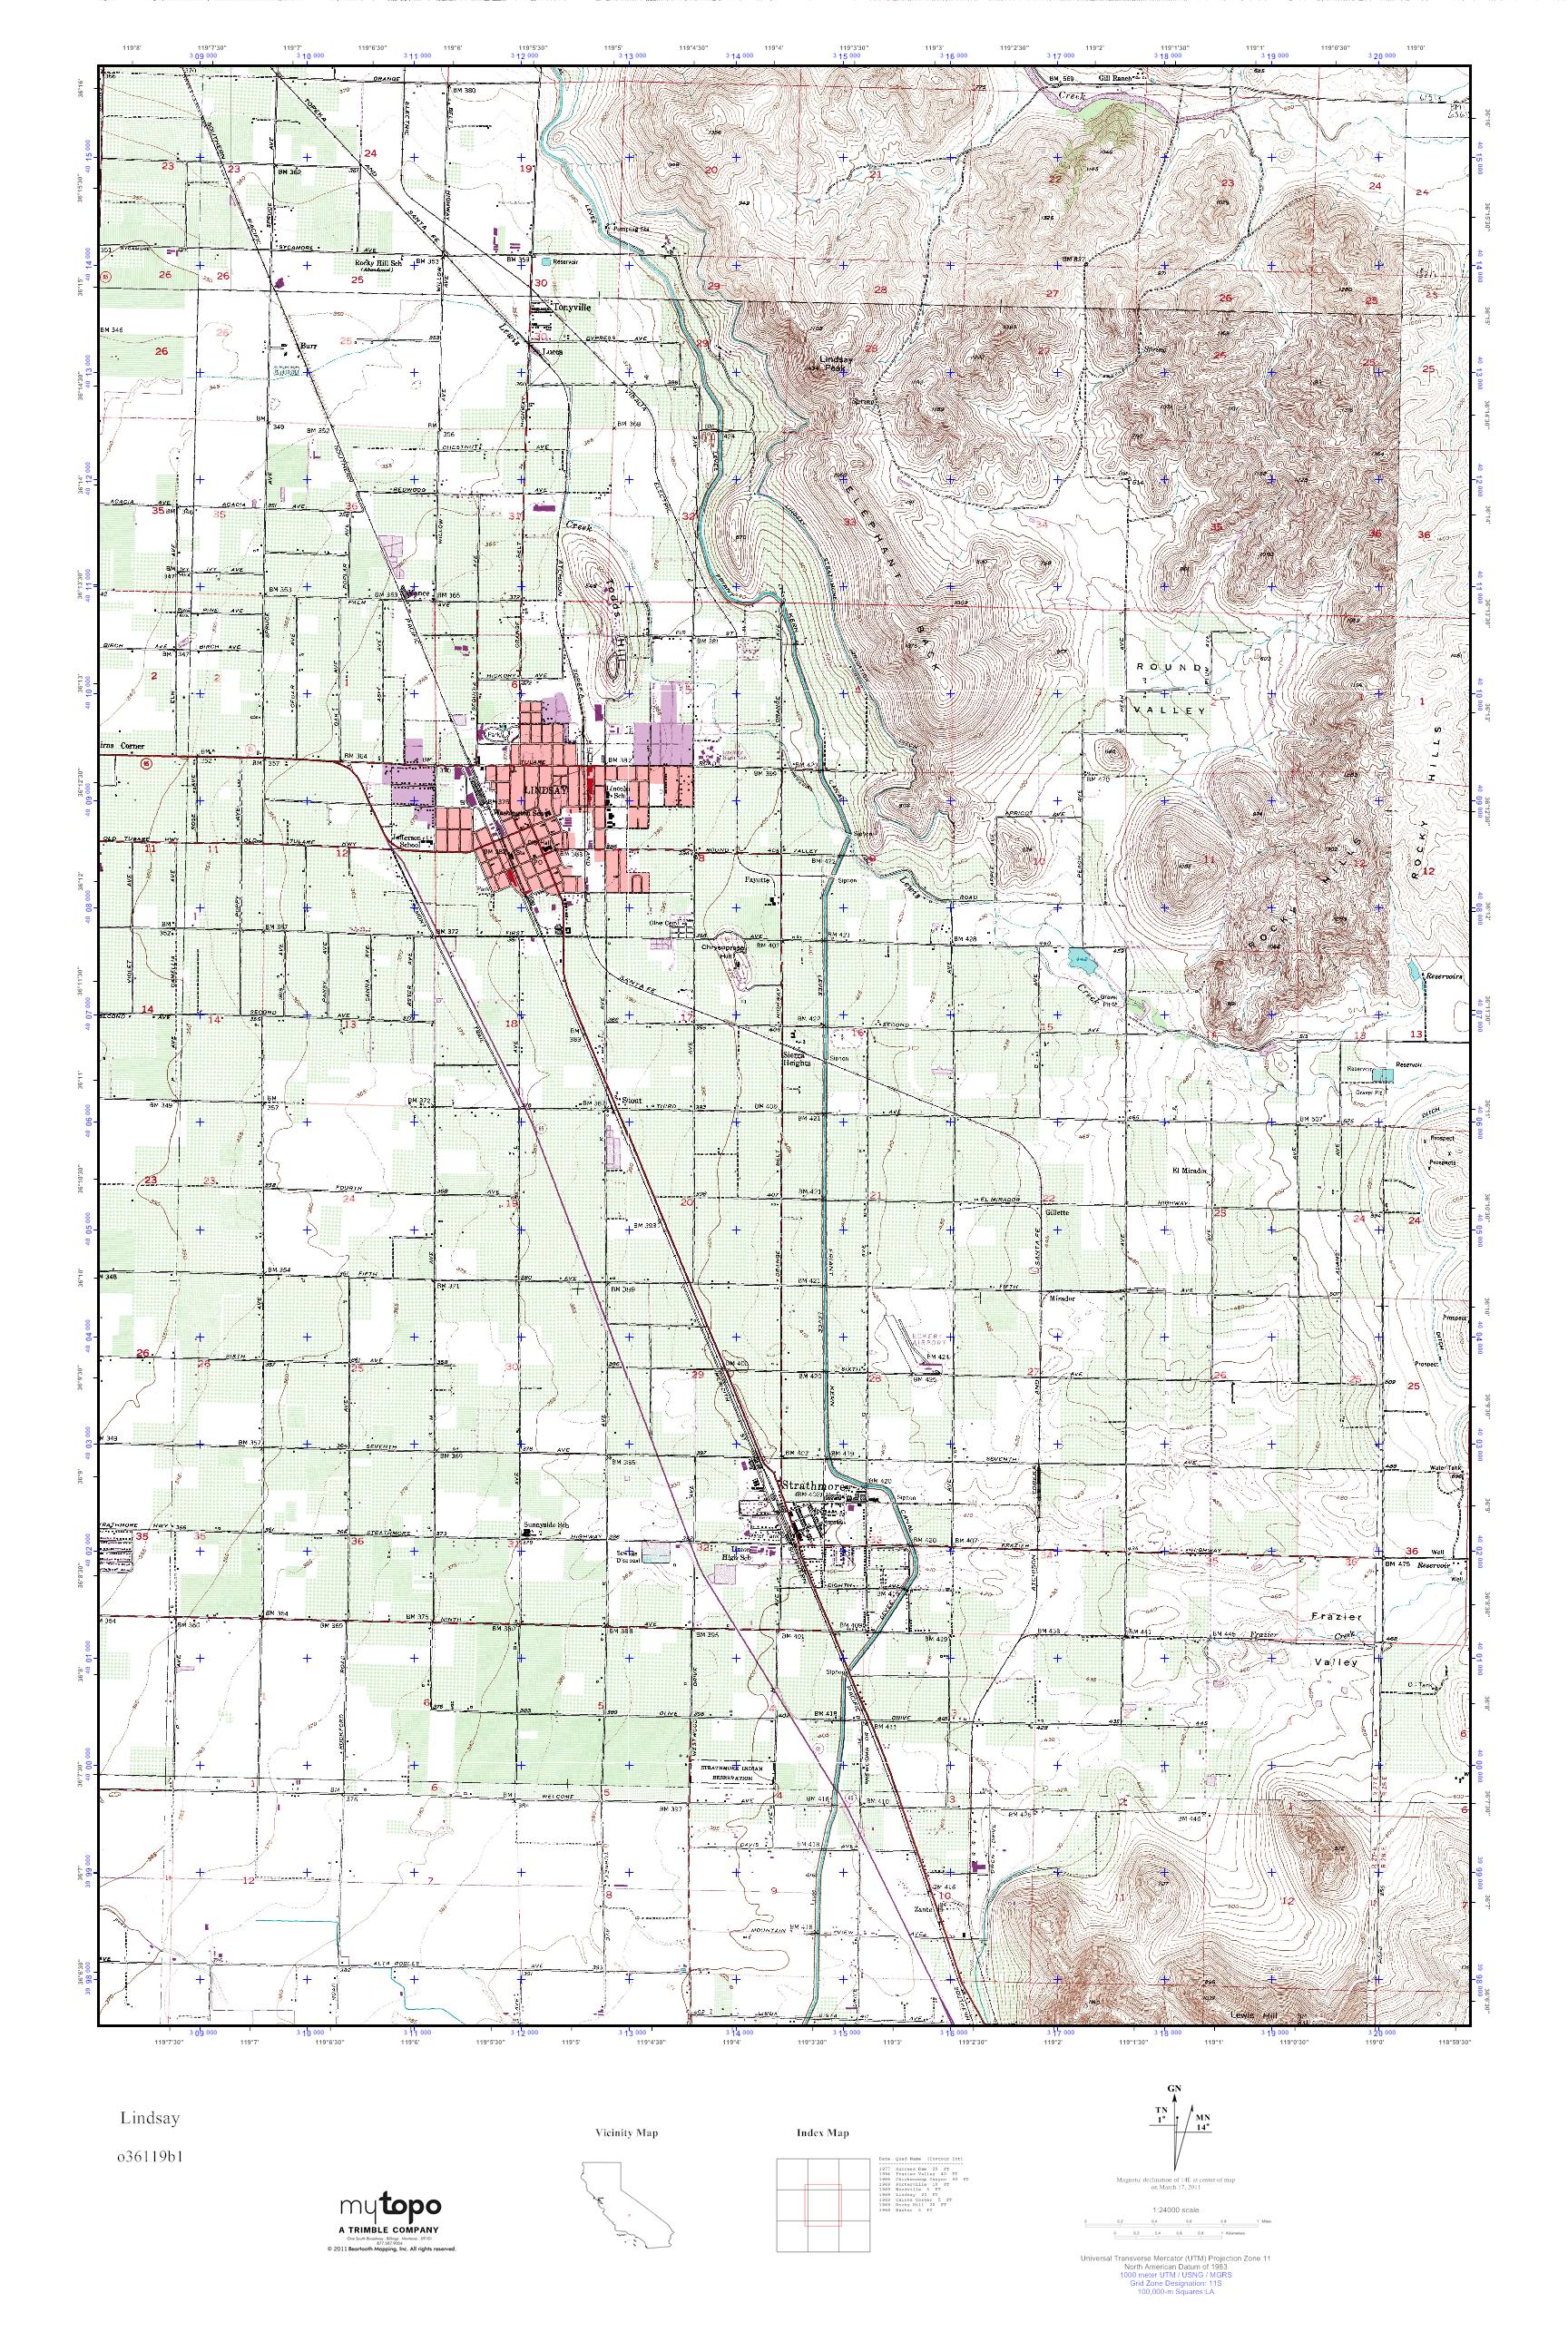 Lindsay California Map.Mytopo Lindsay California Usgs Quad Topo Map